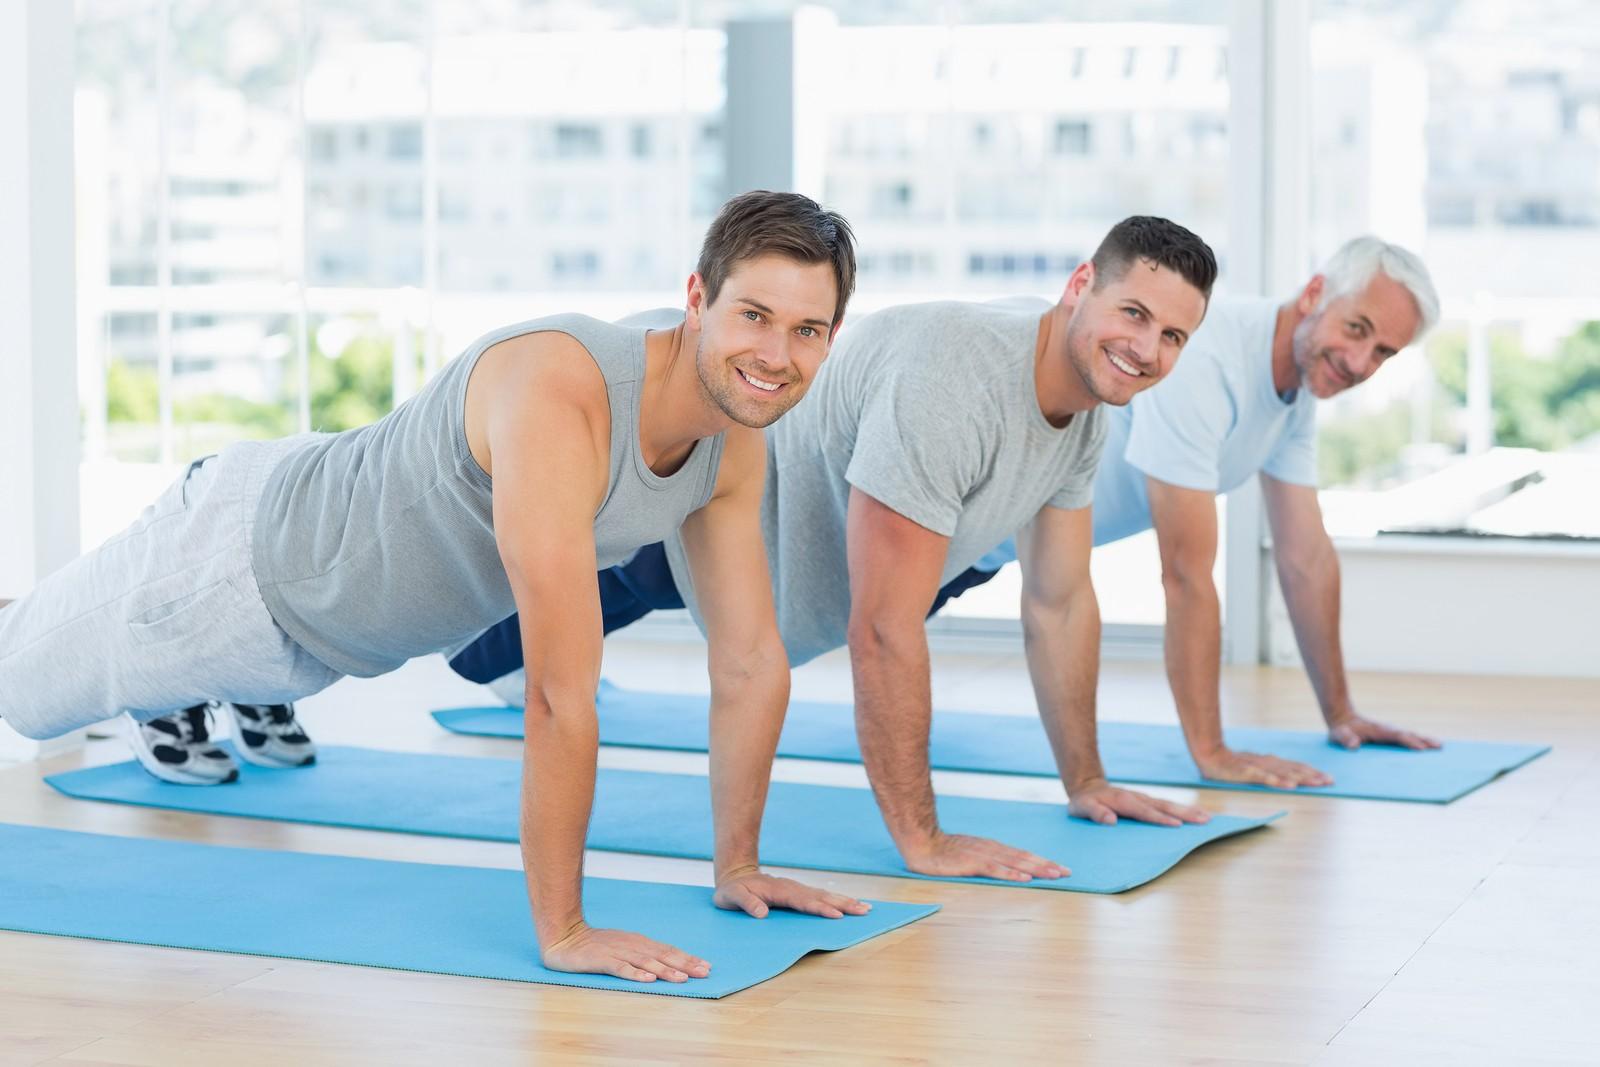 Portrait of happy fit men doing push ups at gym